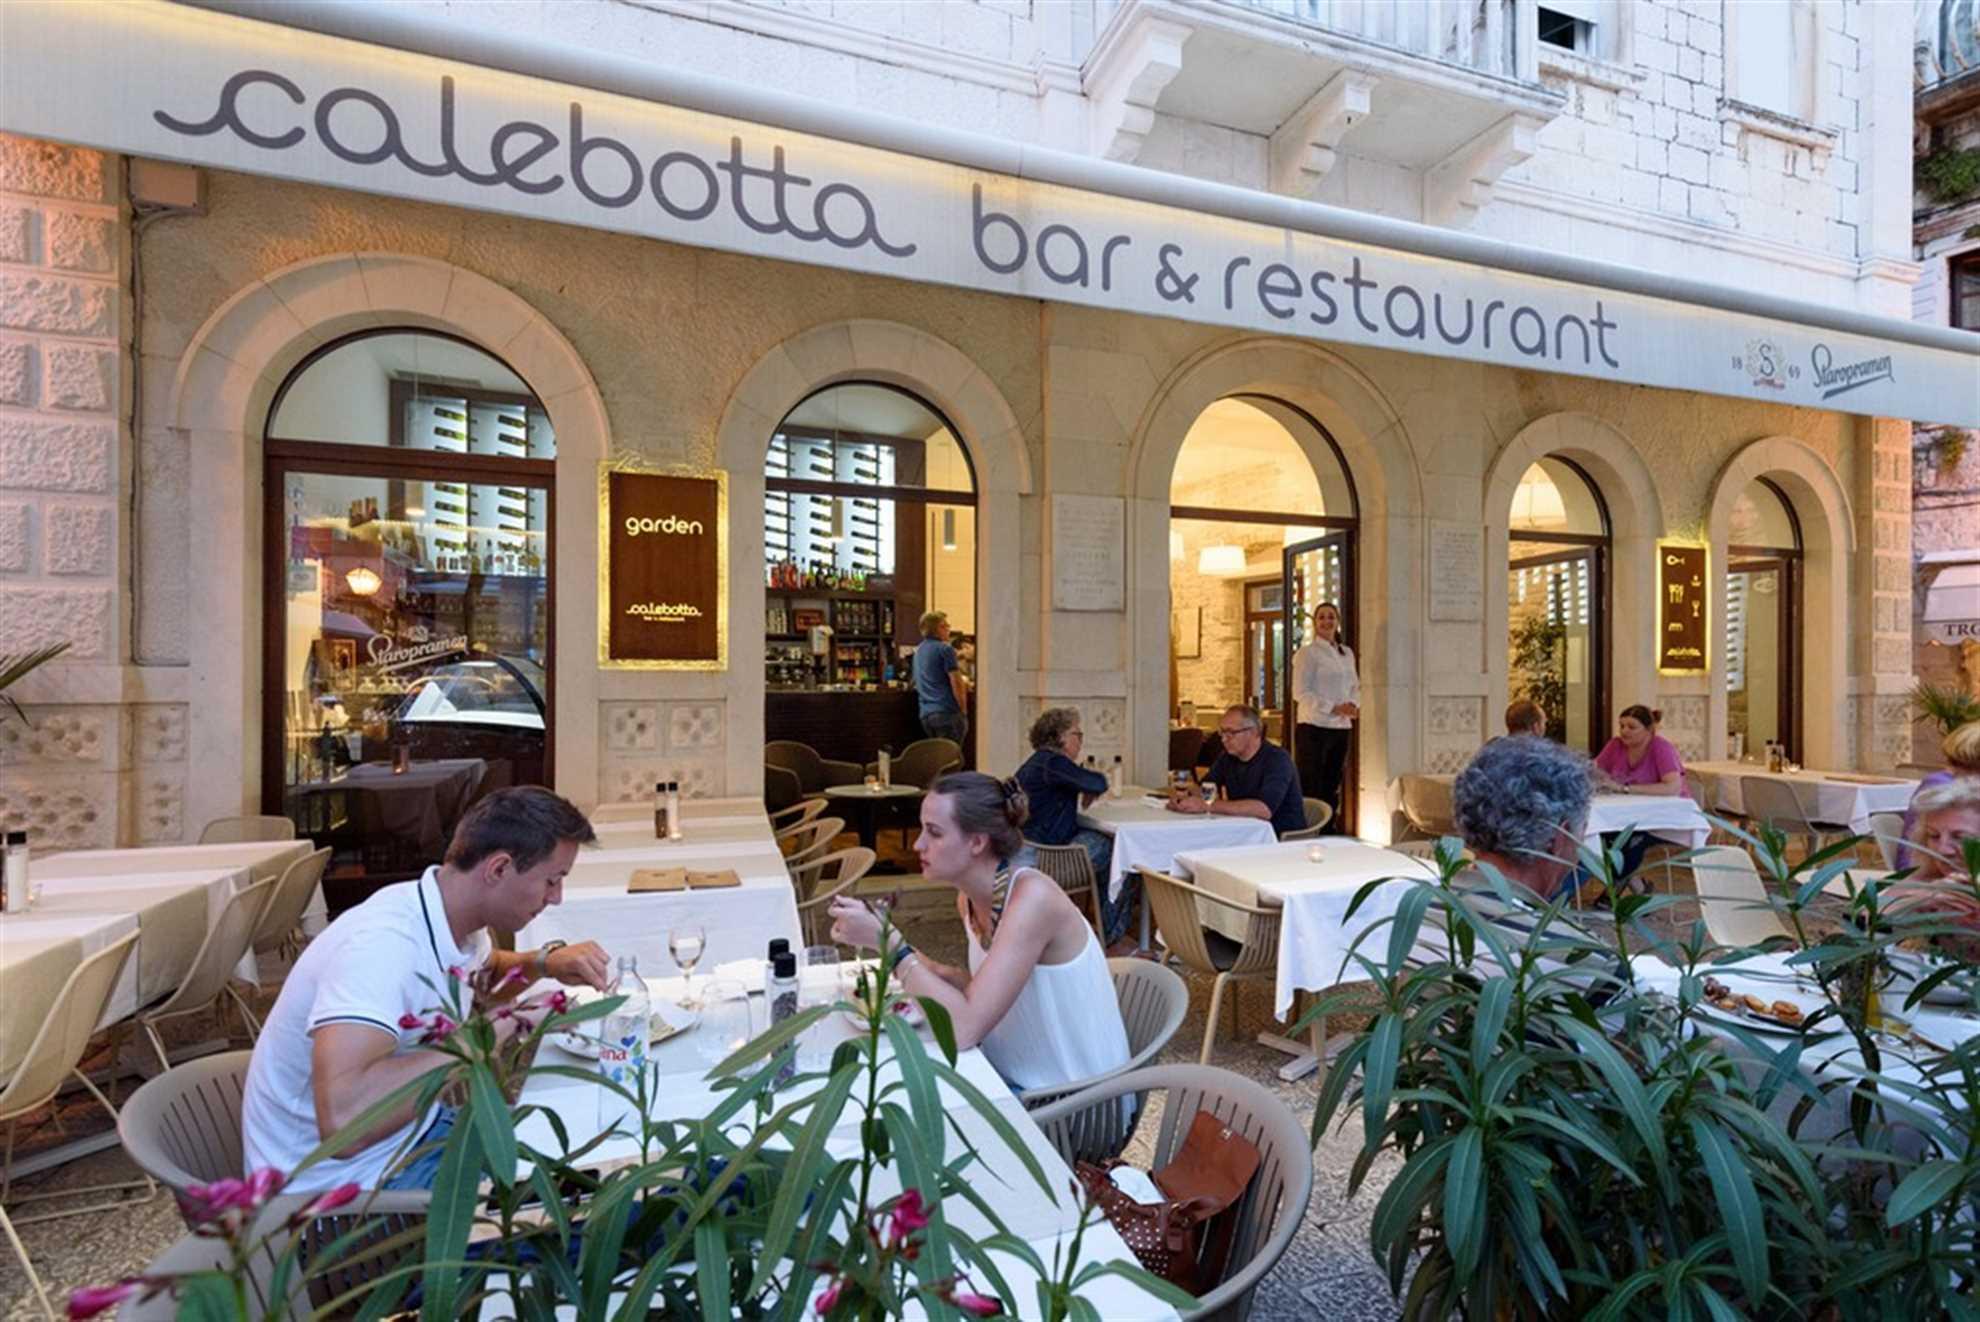 Restaurant Calebotta in Trogir